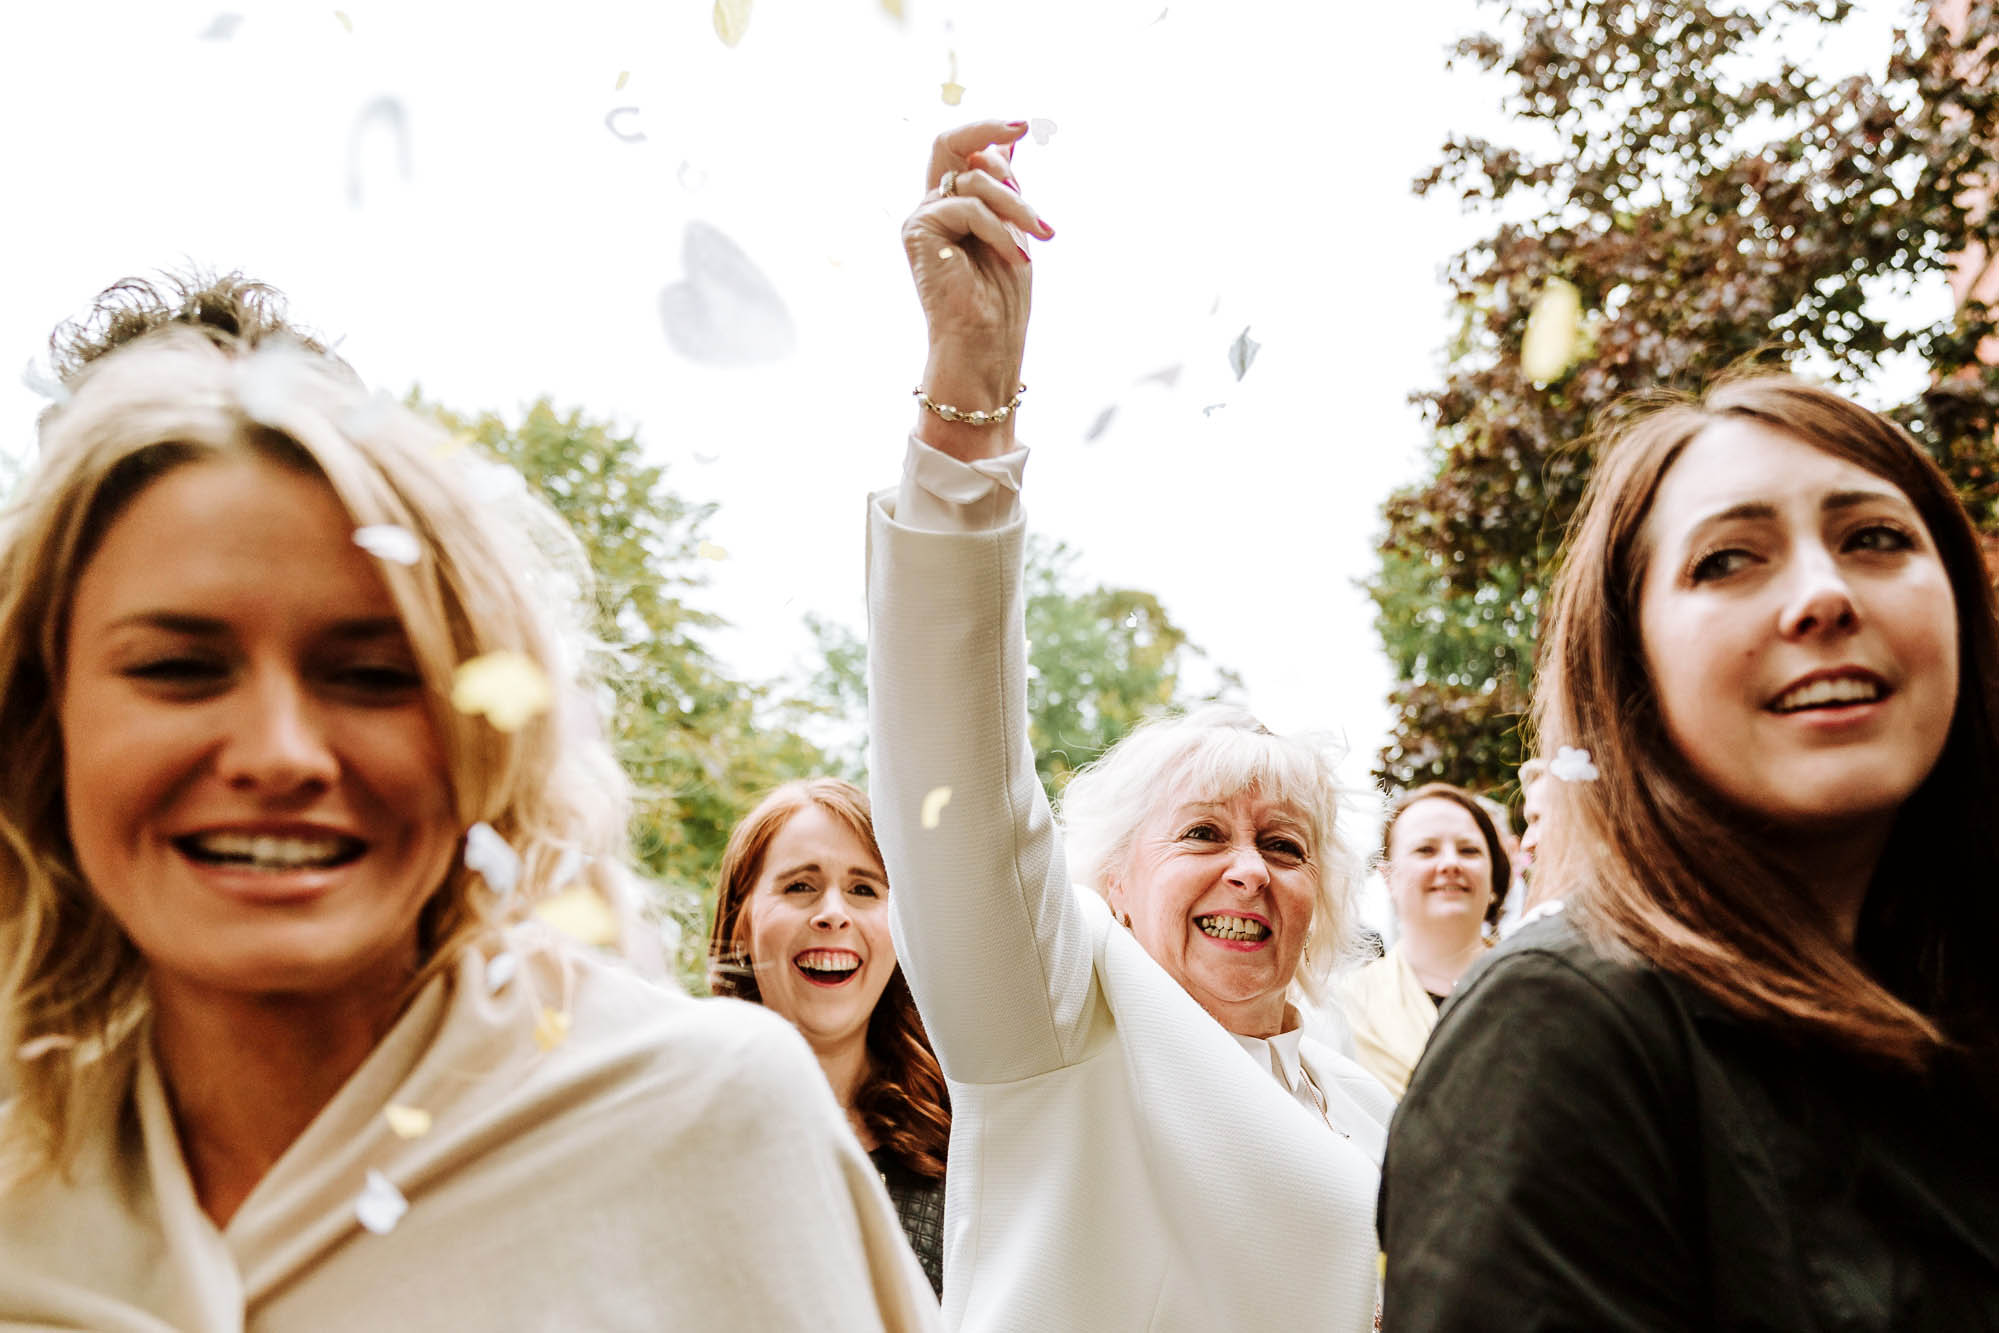 wedding guest tosses confetti